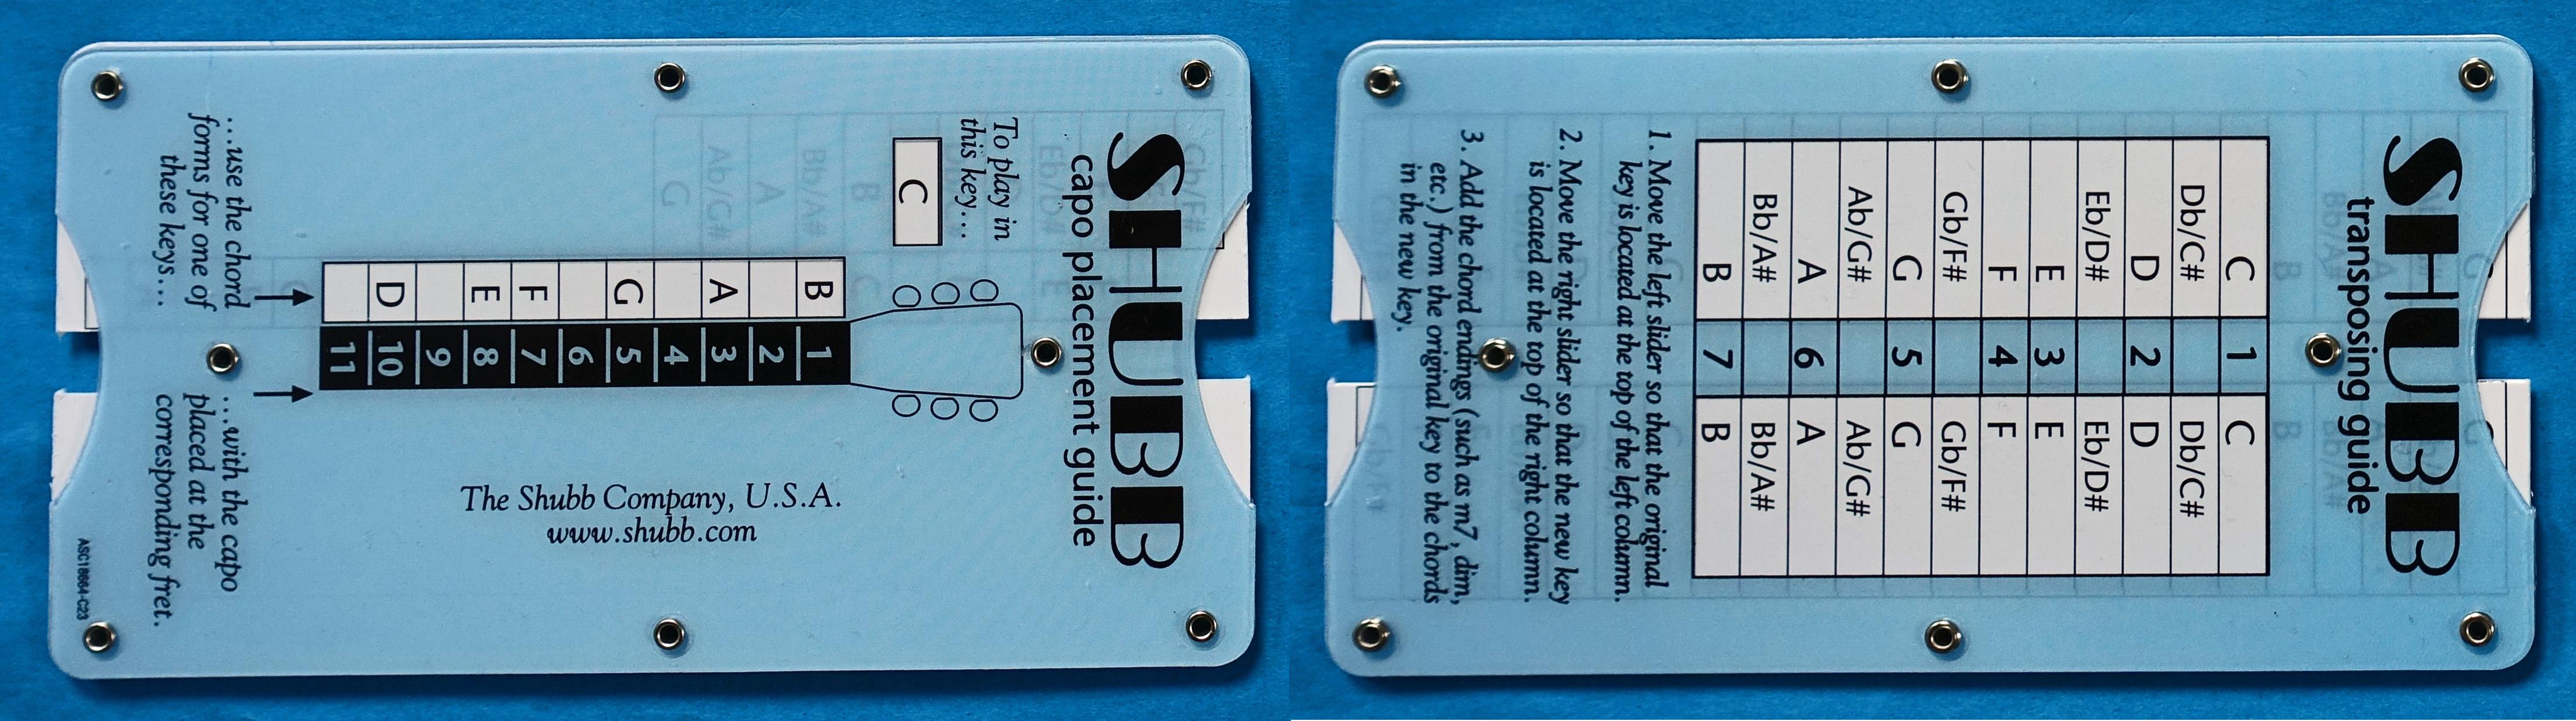 SHUBB TG1 Pocket Music Guitar Transposer